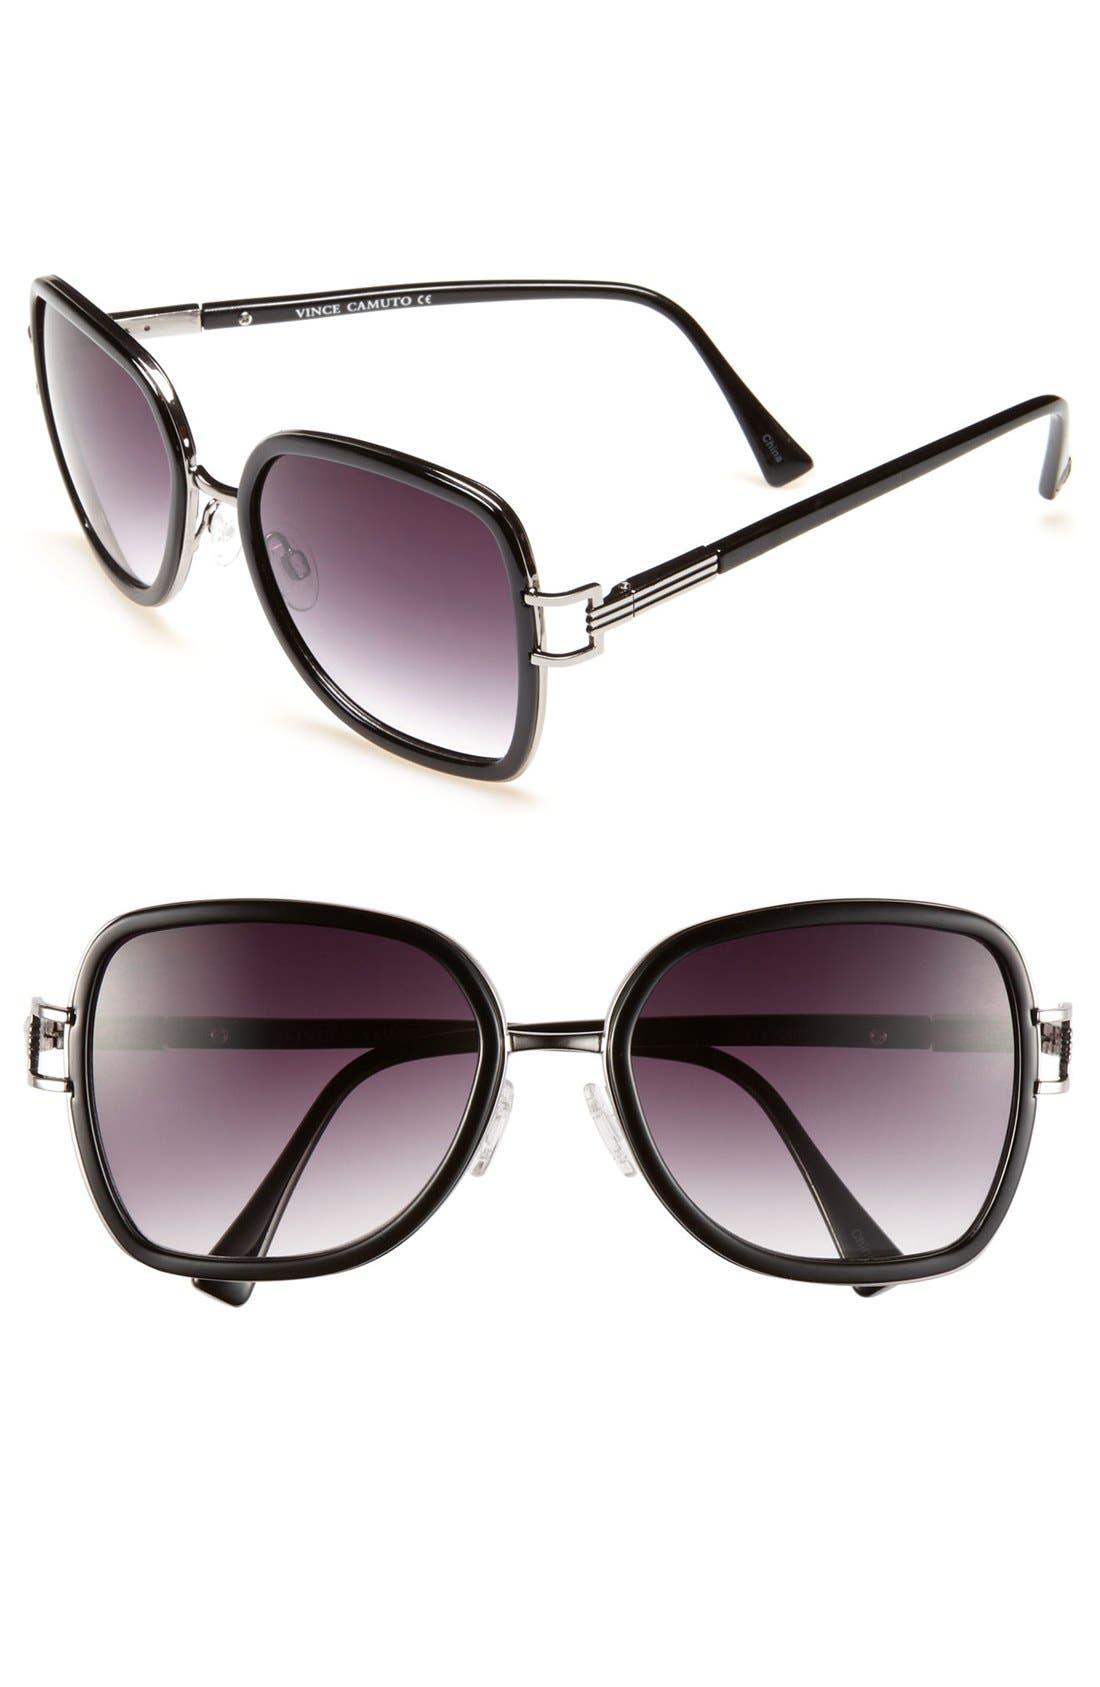 Alternate Image 1 Selected - Vince Camuto Retro Sunglasses